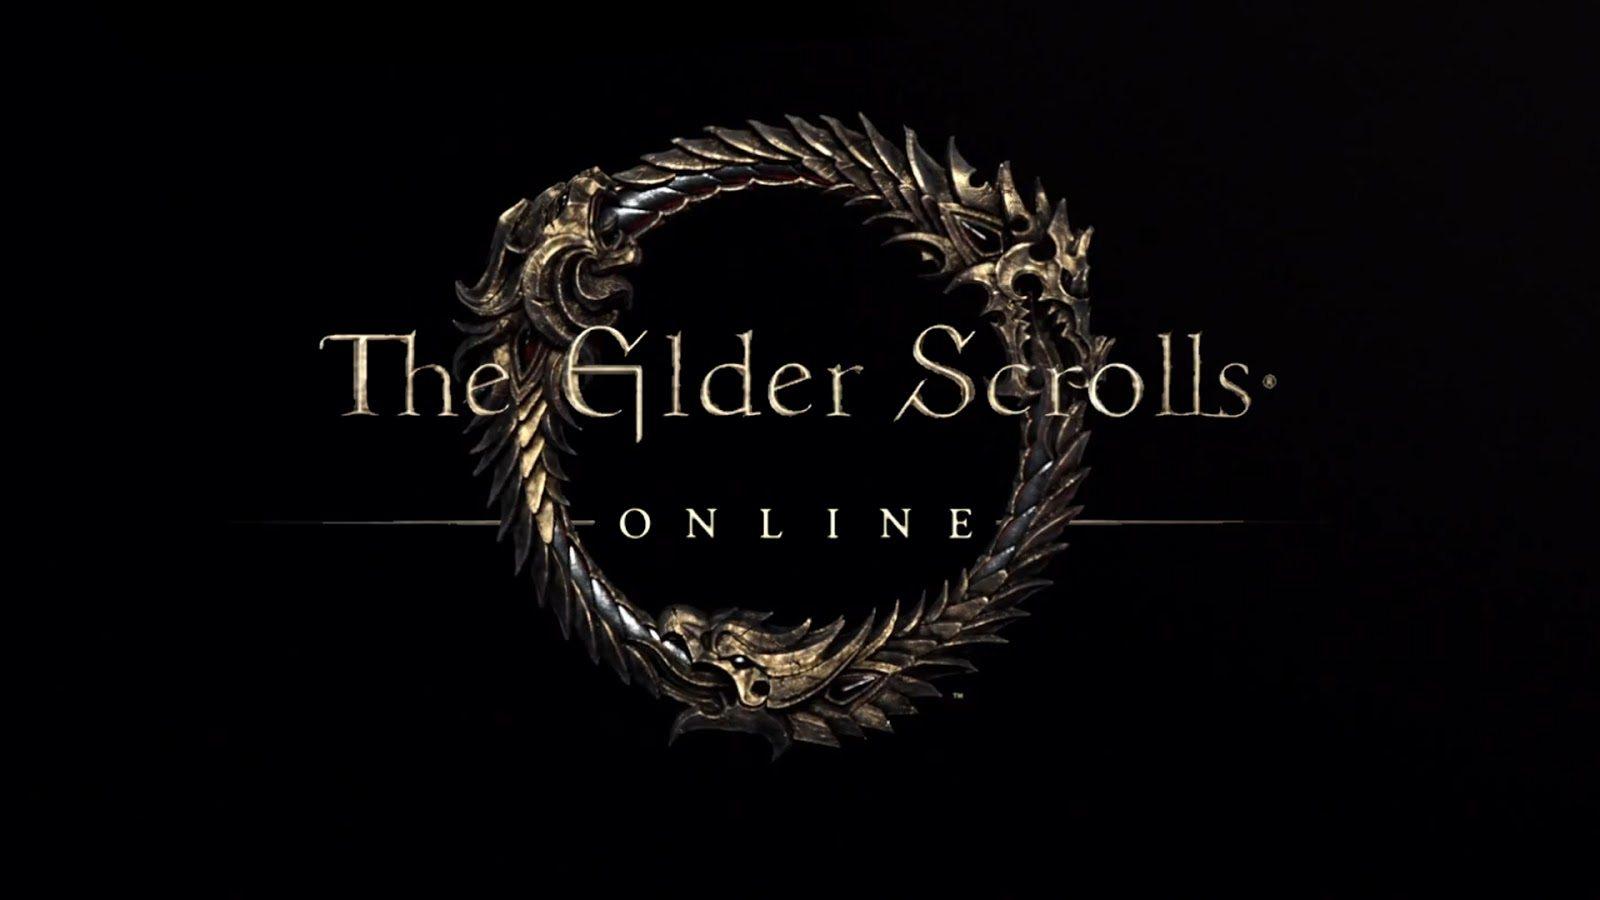 The Elder Scrolls videogioco